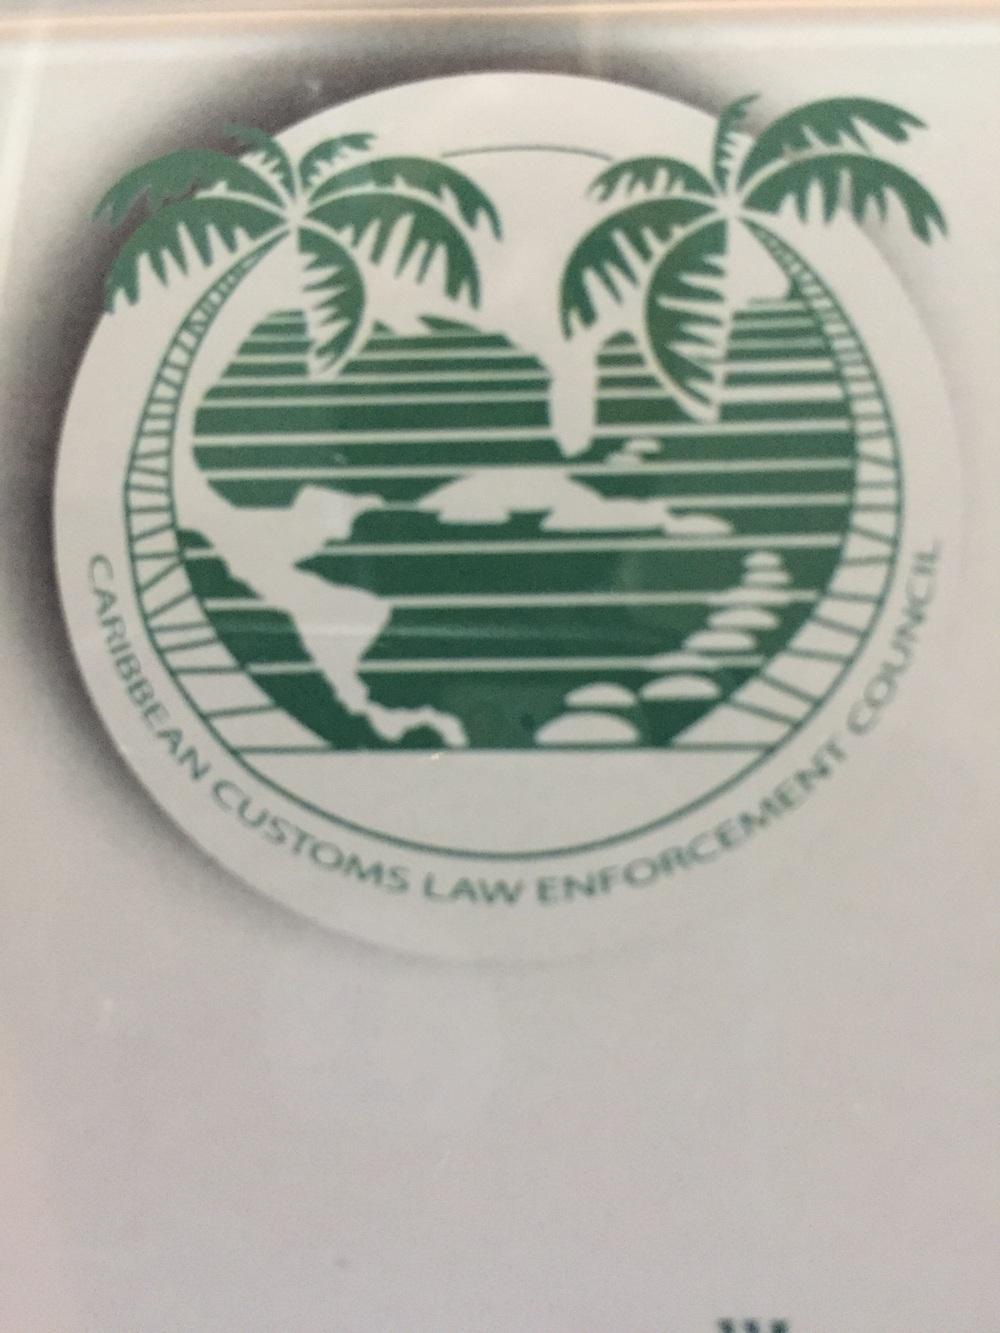 CCLEC logo